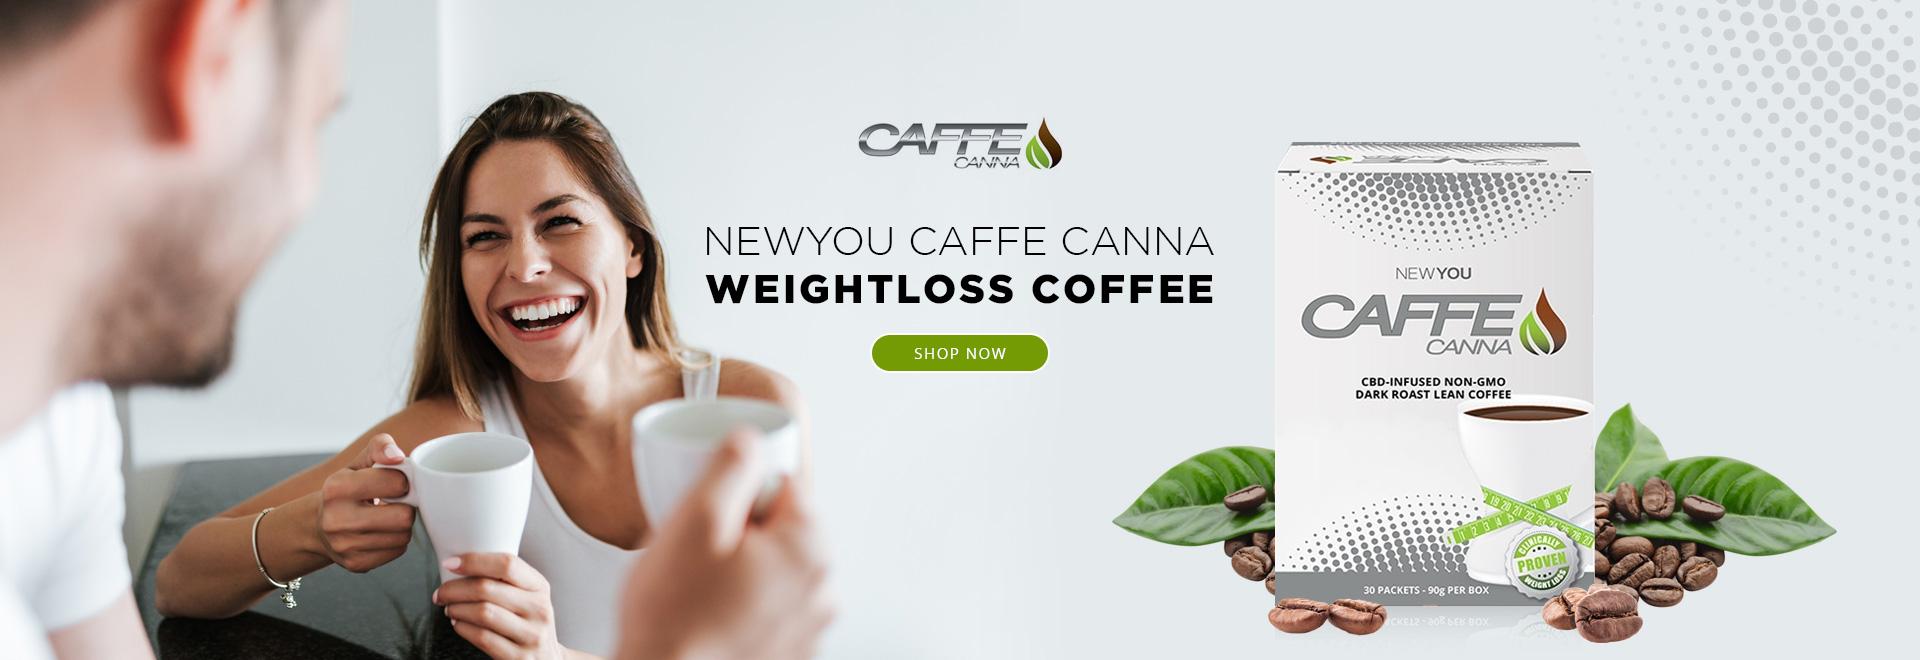 Caffe Canna - Weightloss Coffee